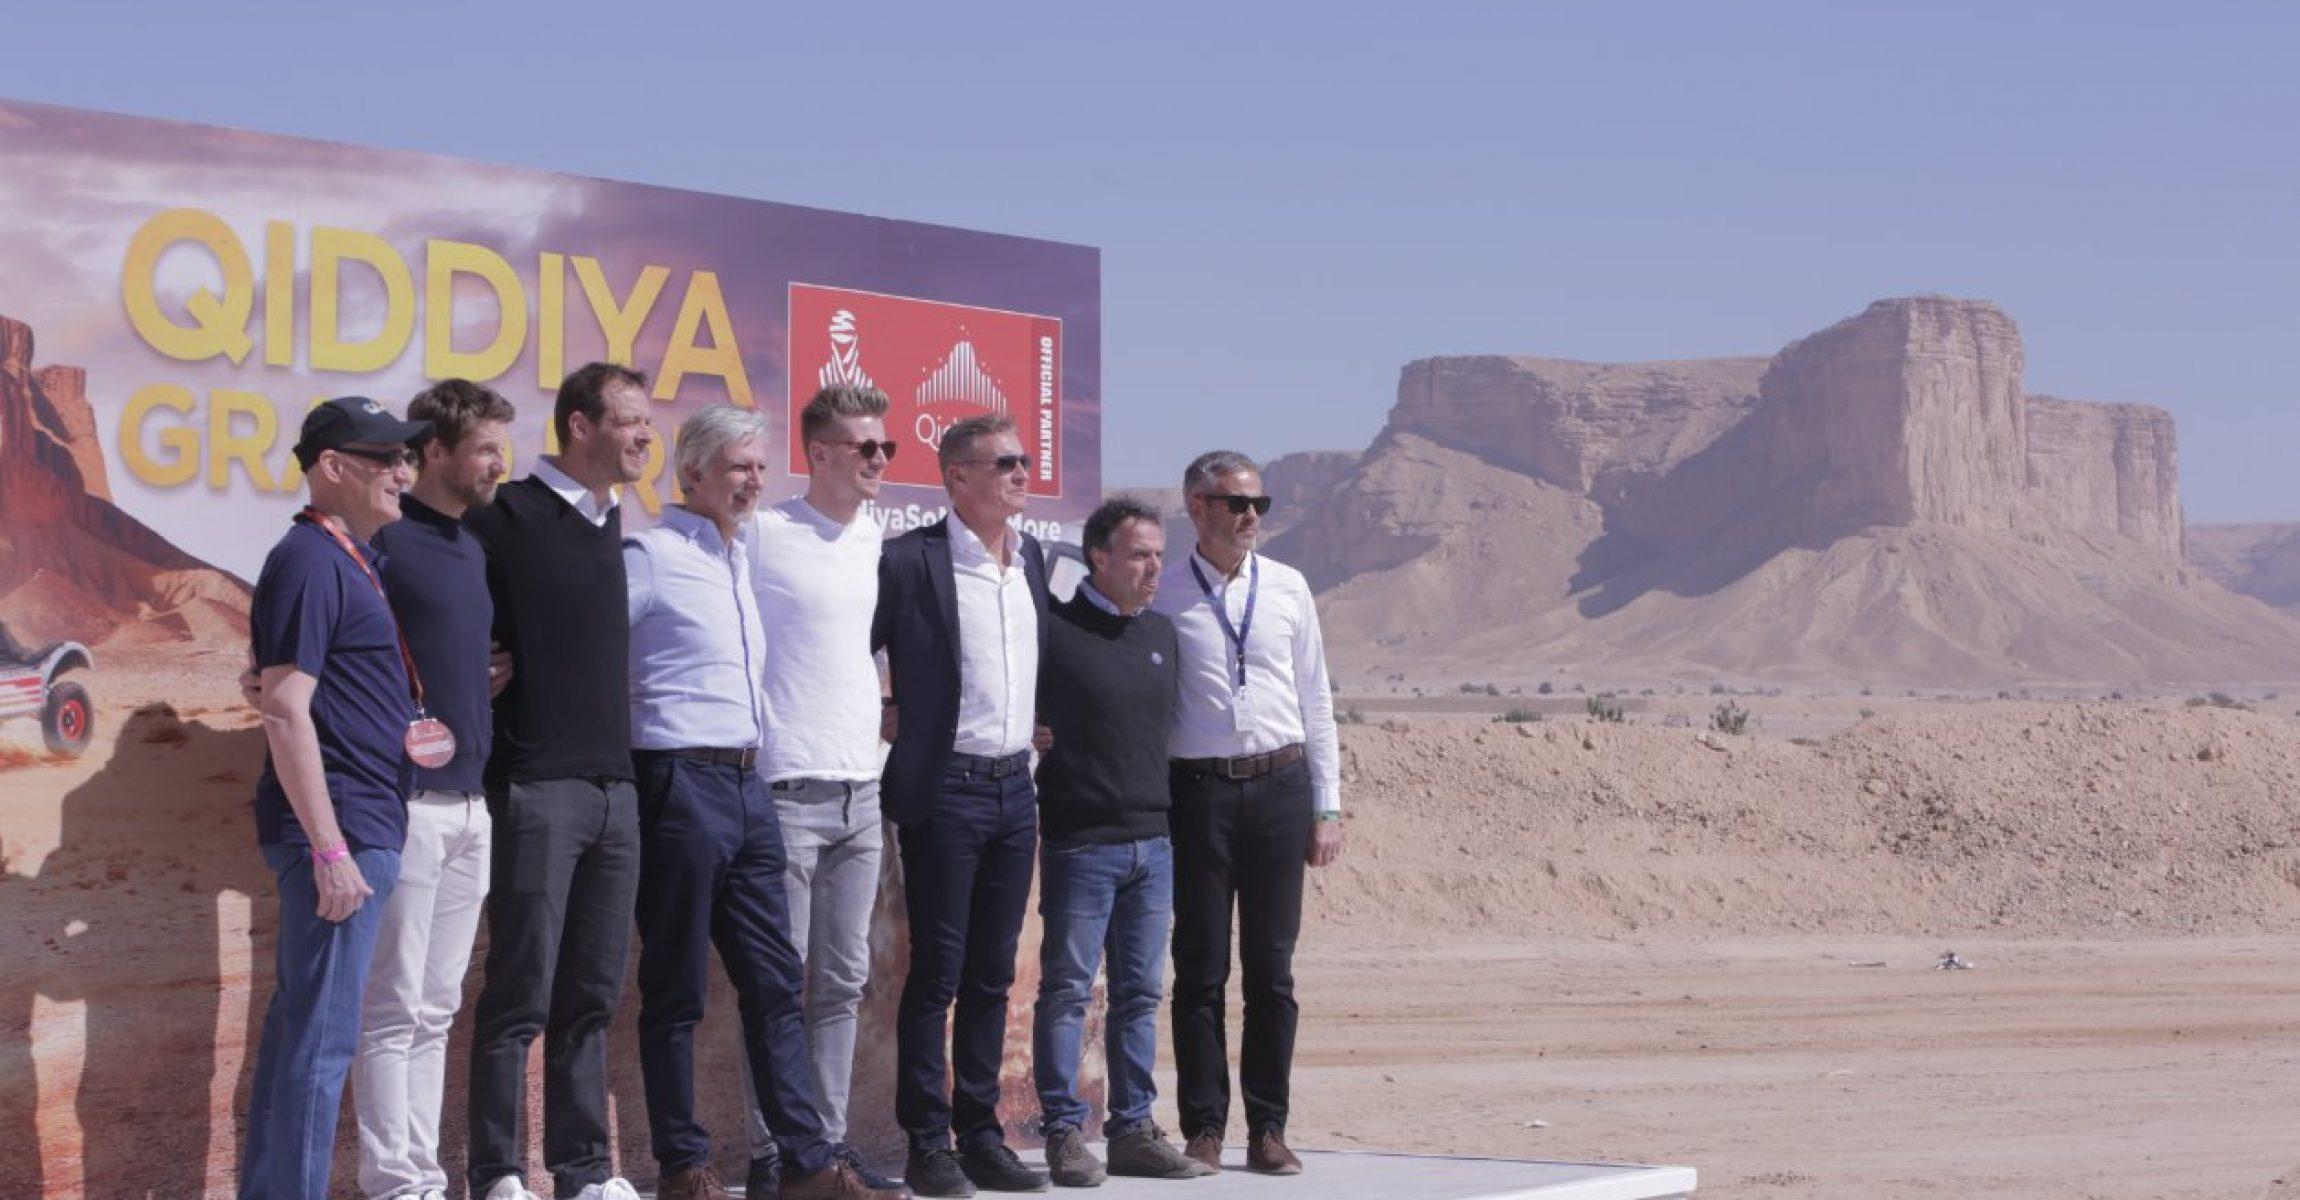 Qiddiya, Saud-Arabian Grand Prix